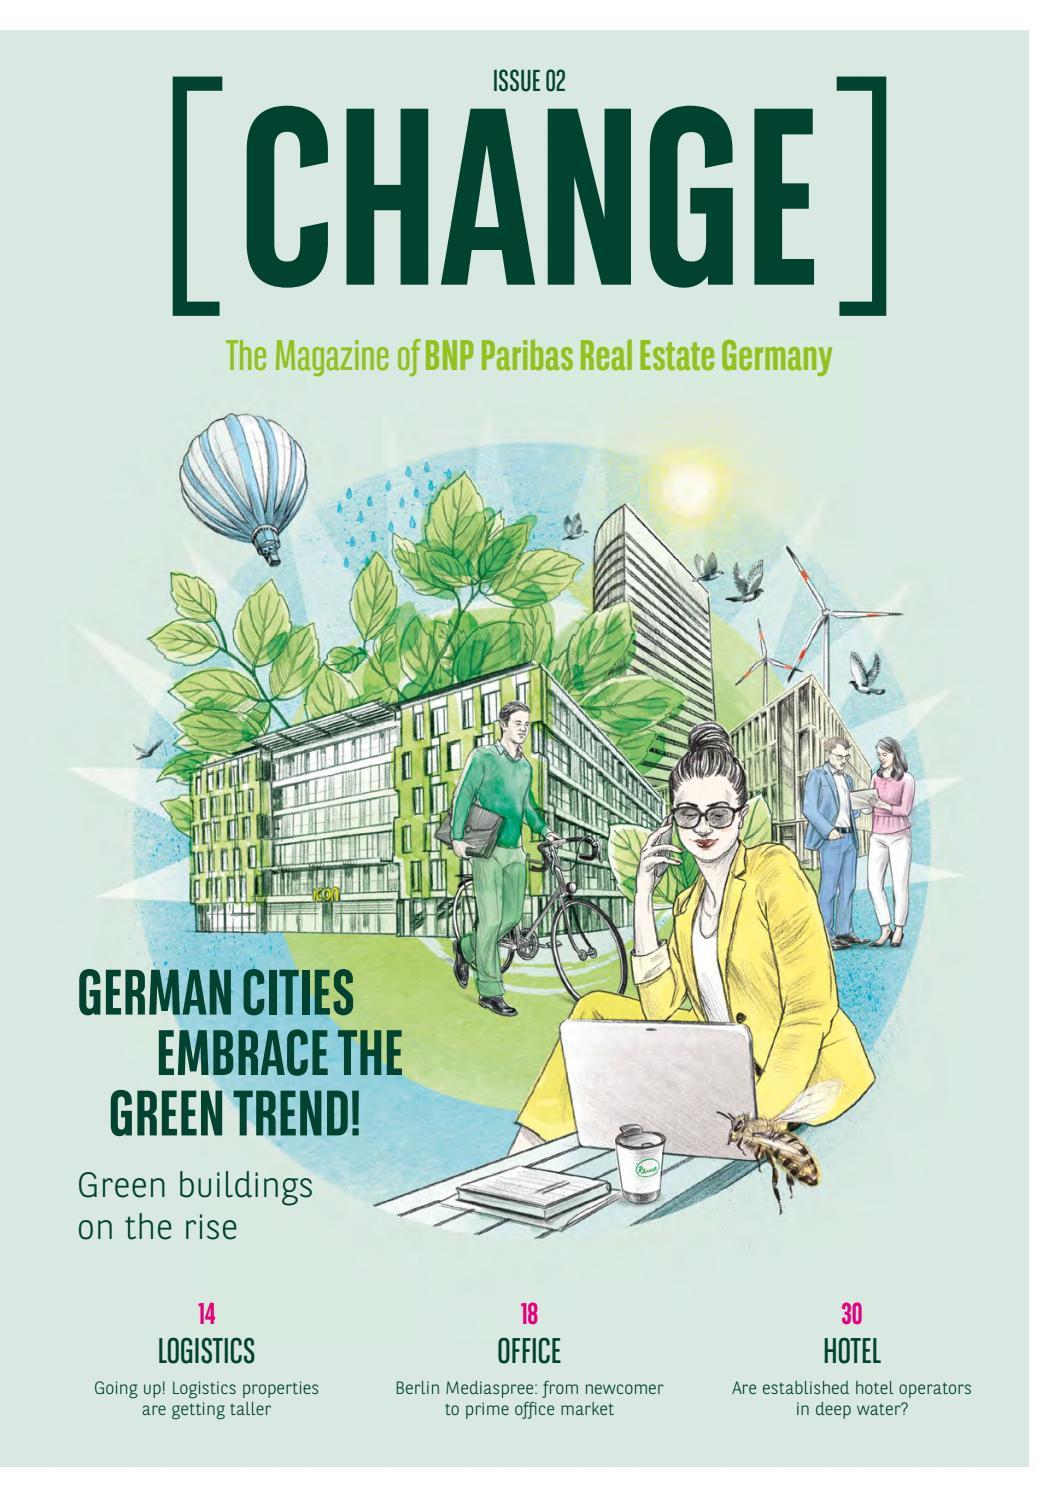 Change The Magazine Of Bnp Paribas Real Estate Germany